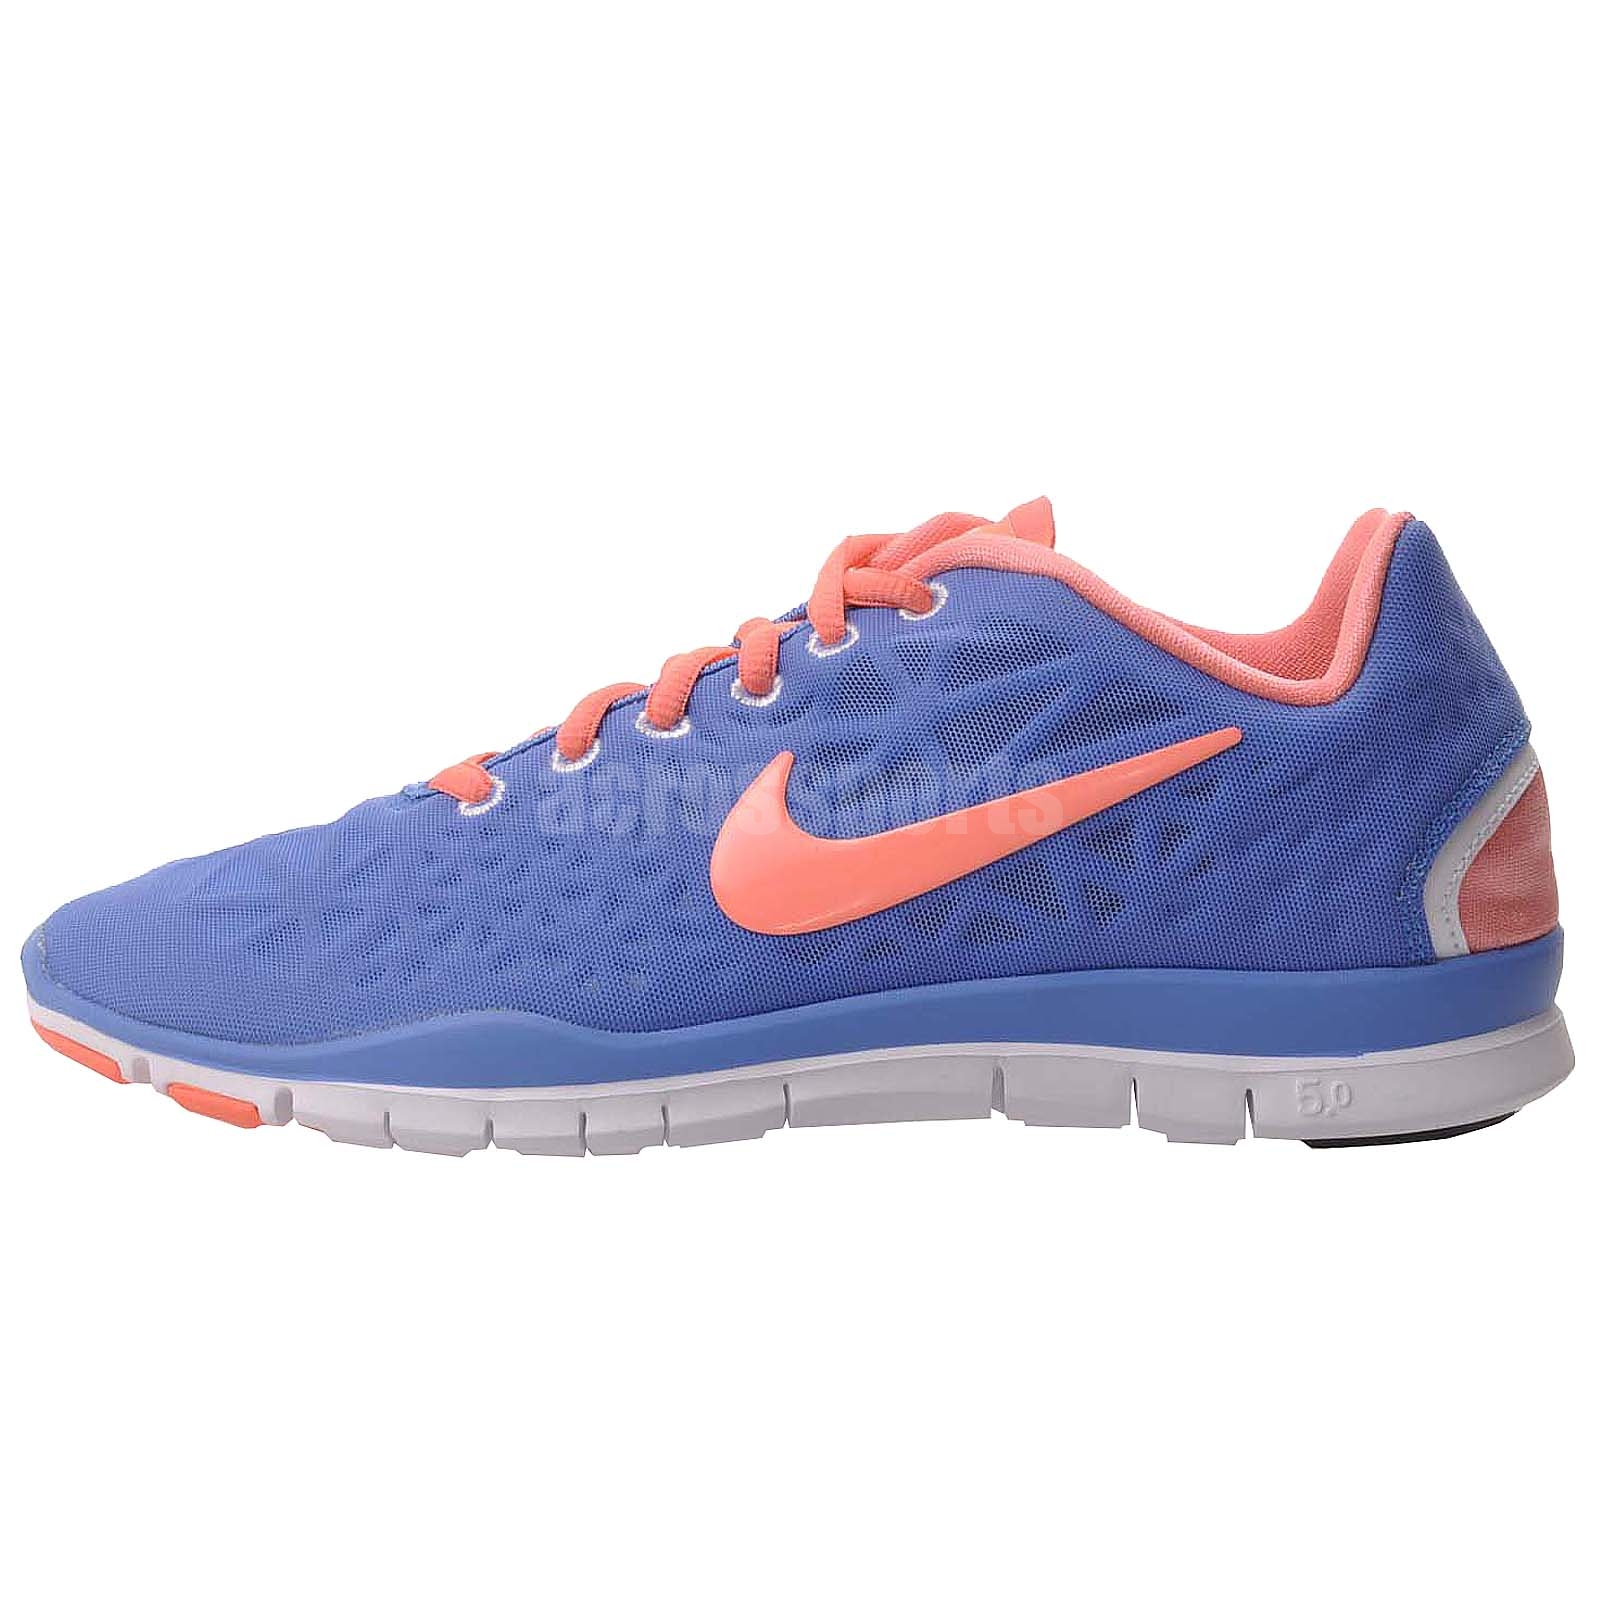 3c7518dad6fc Nike Roshe American Flag Shoes